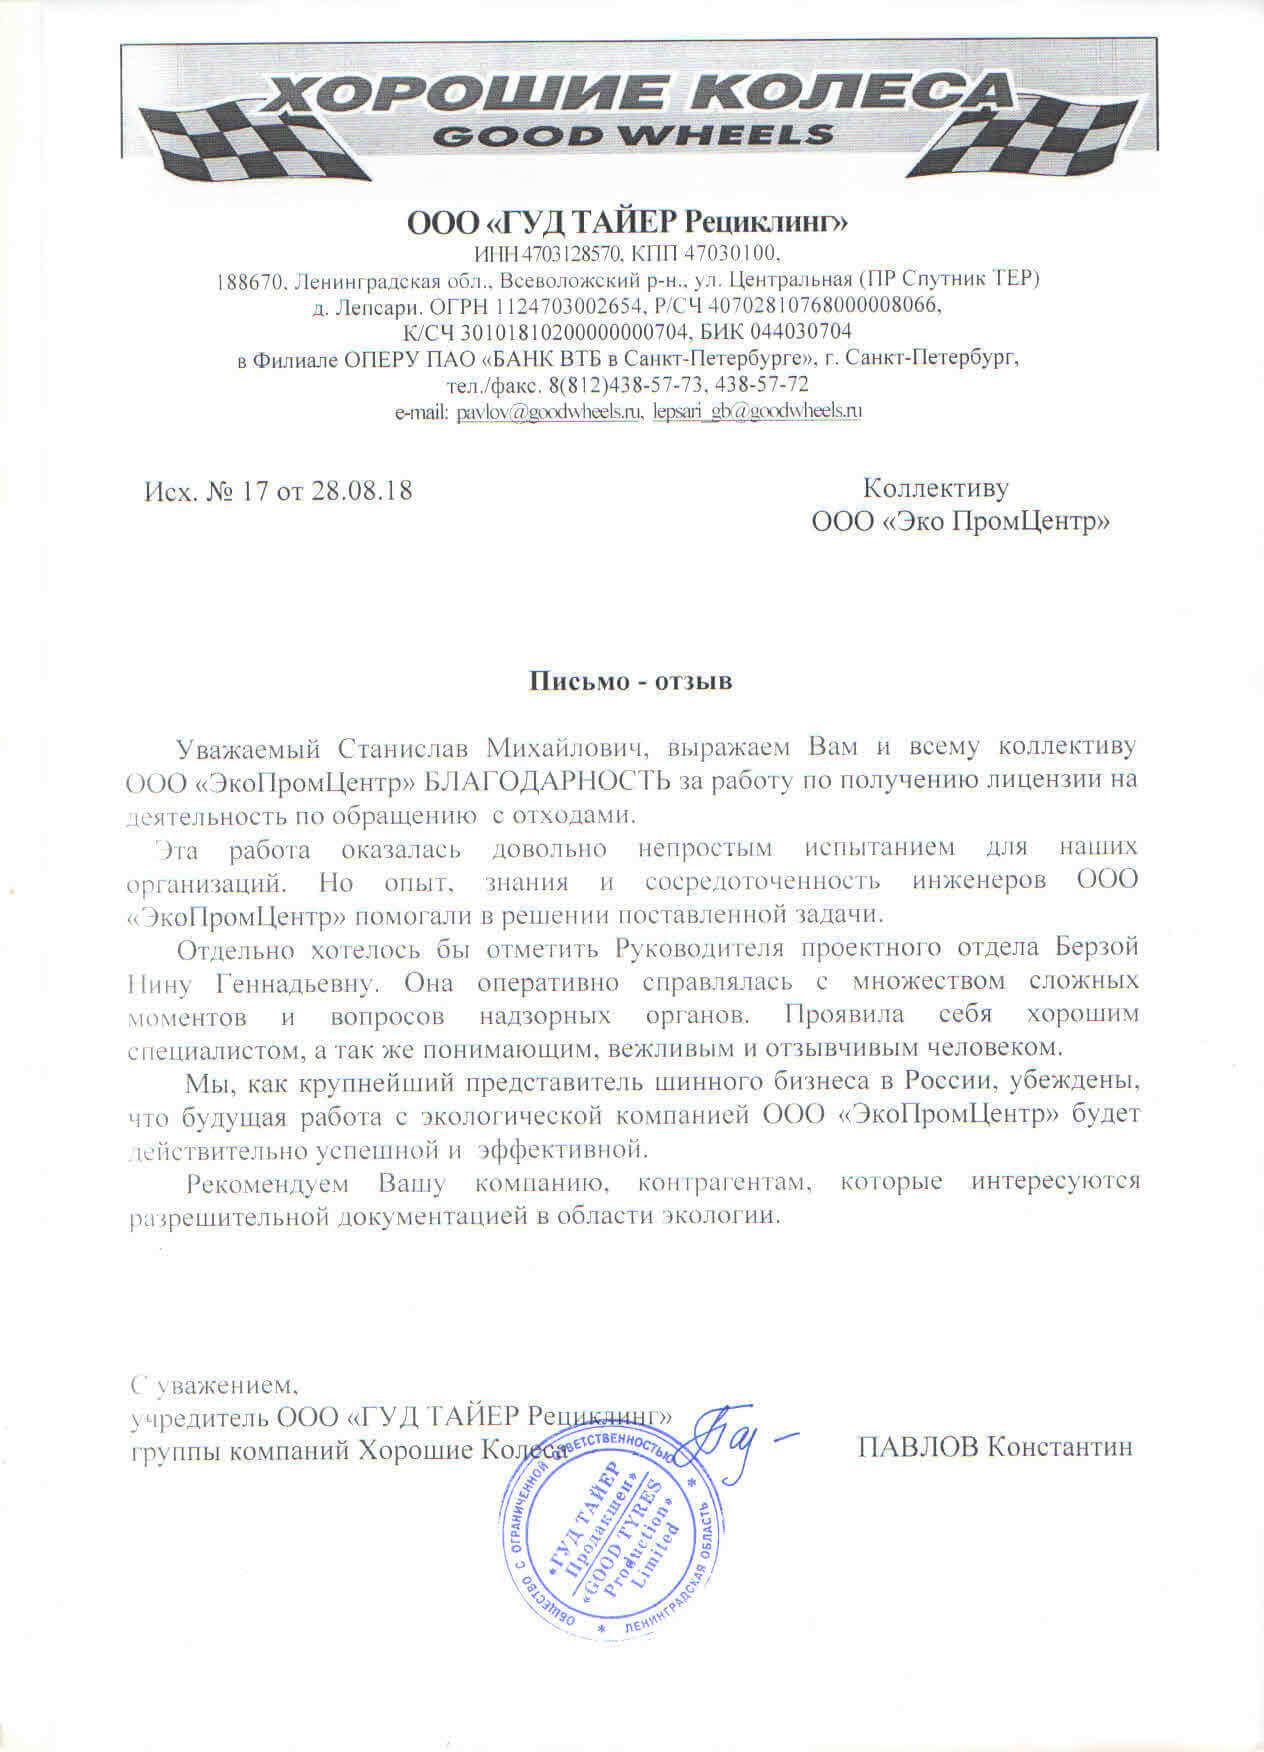 Отзыв ГУД ТАЙЕР Рециклинг